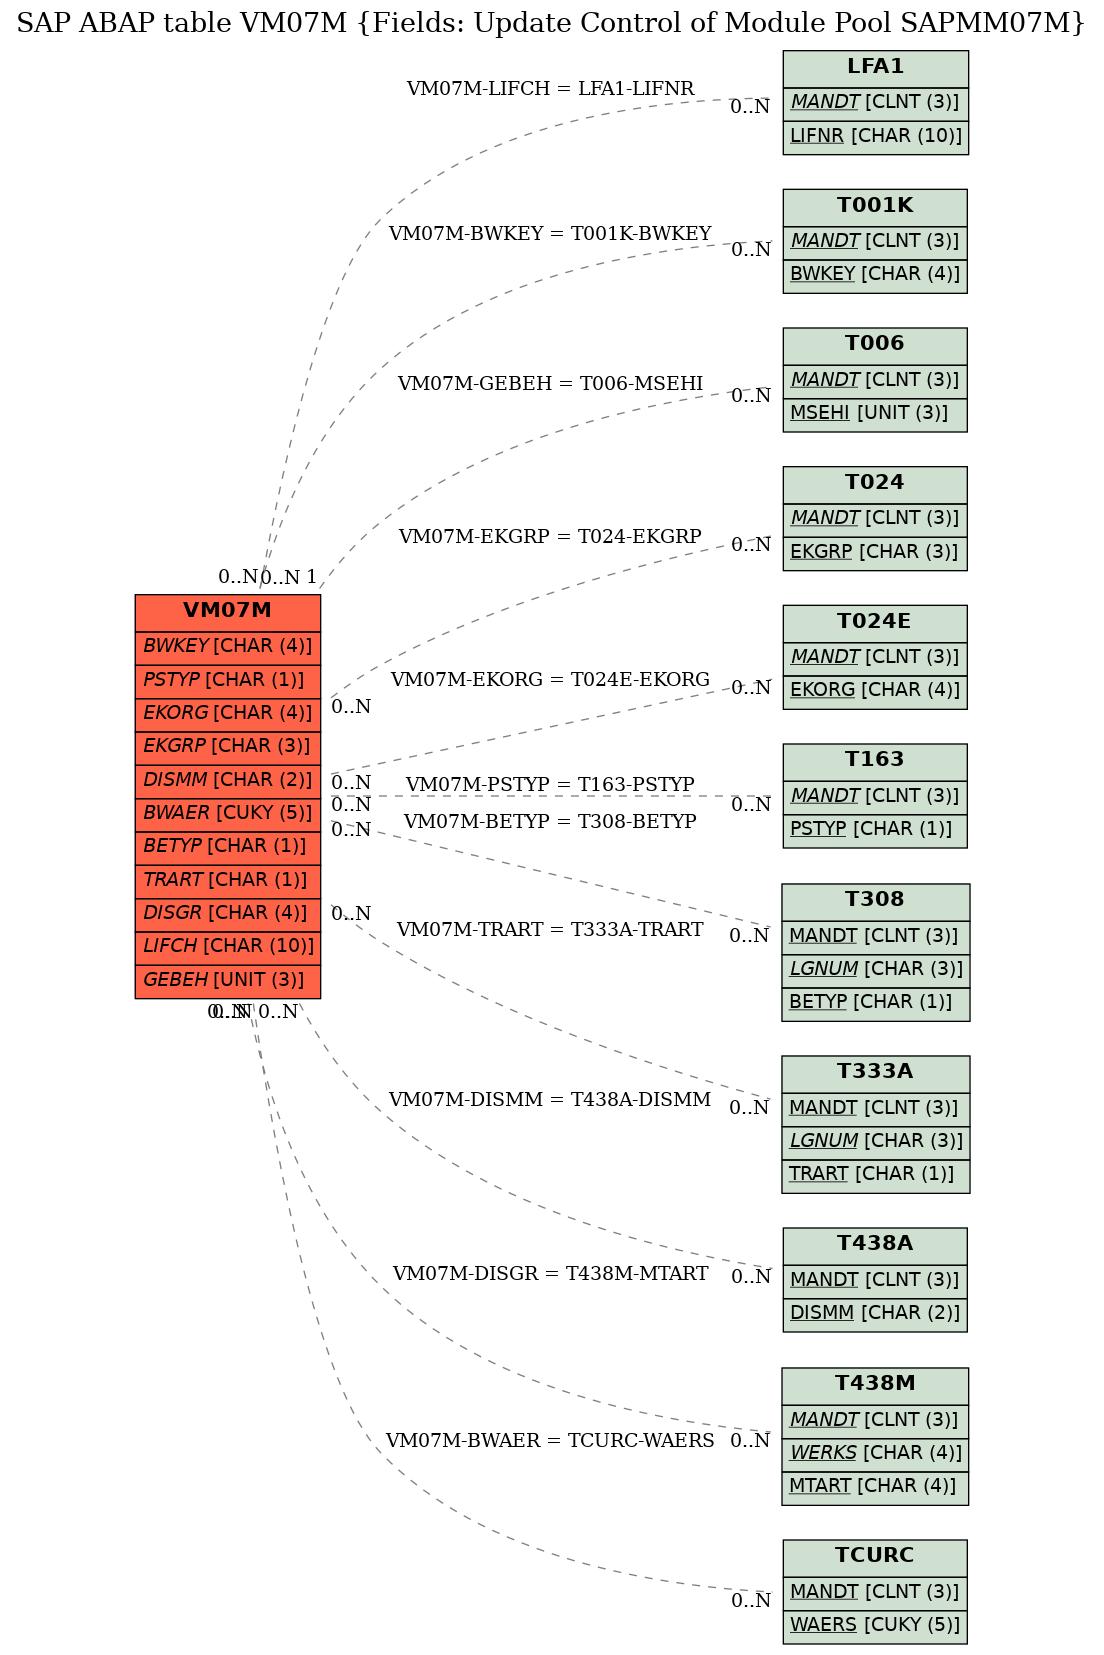 SAP ABAP Table VM07M (Fields: Update Control of Module Pool